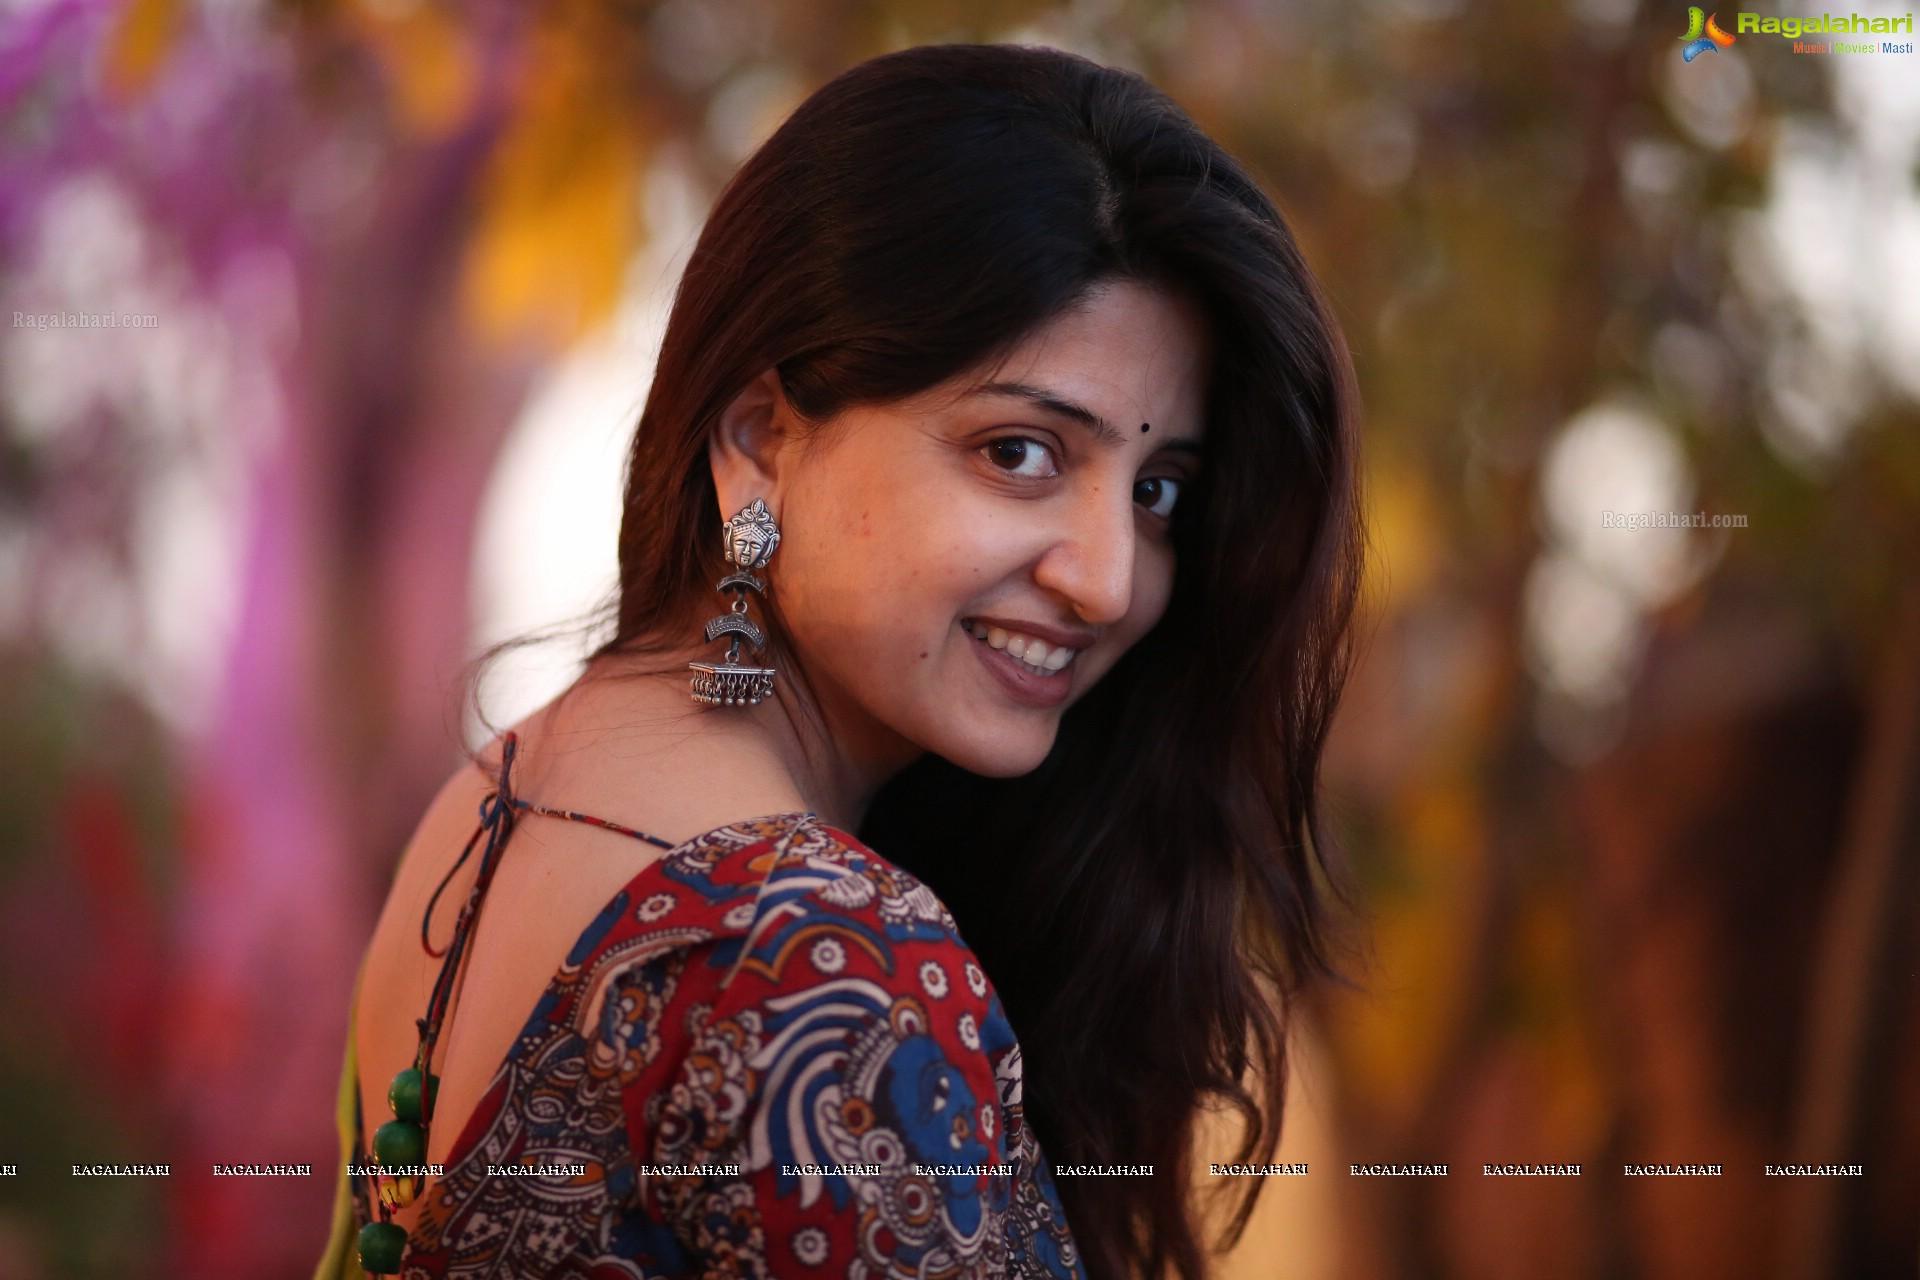 poonam kaur lal (high definition) image 19   telugu actress hot